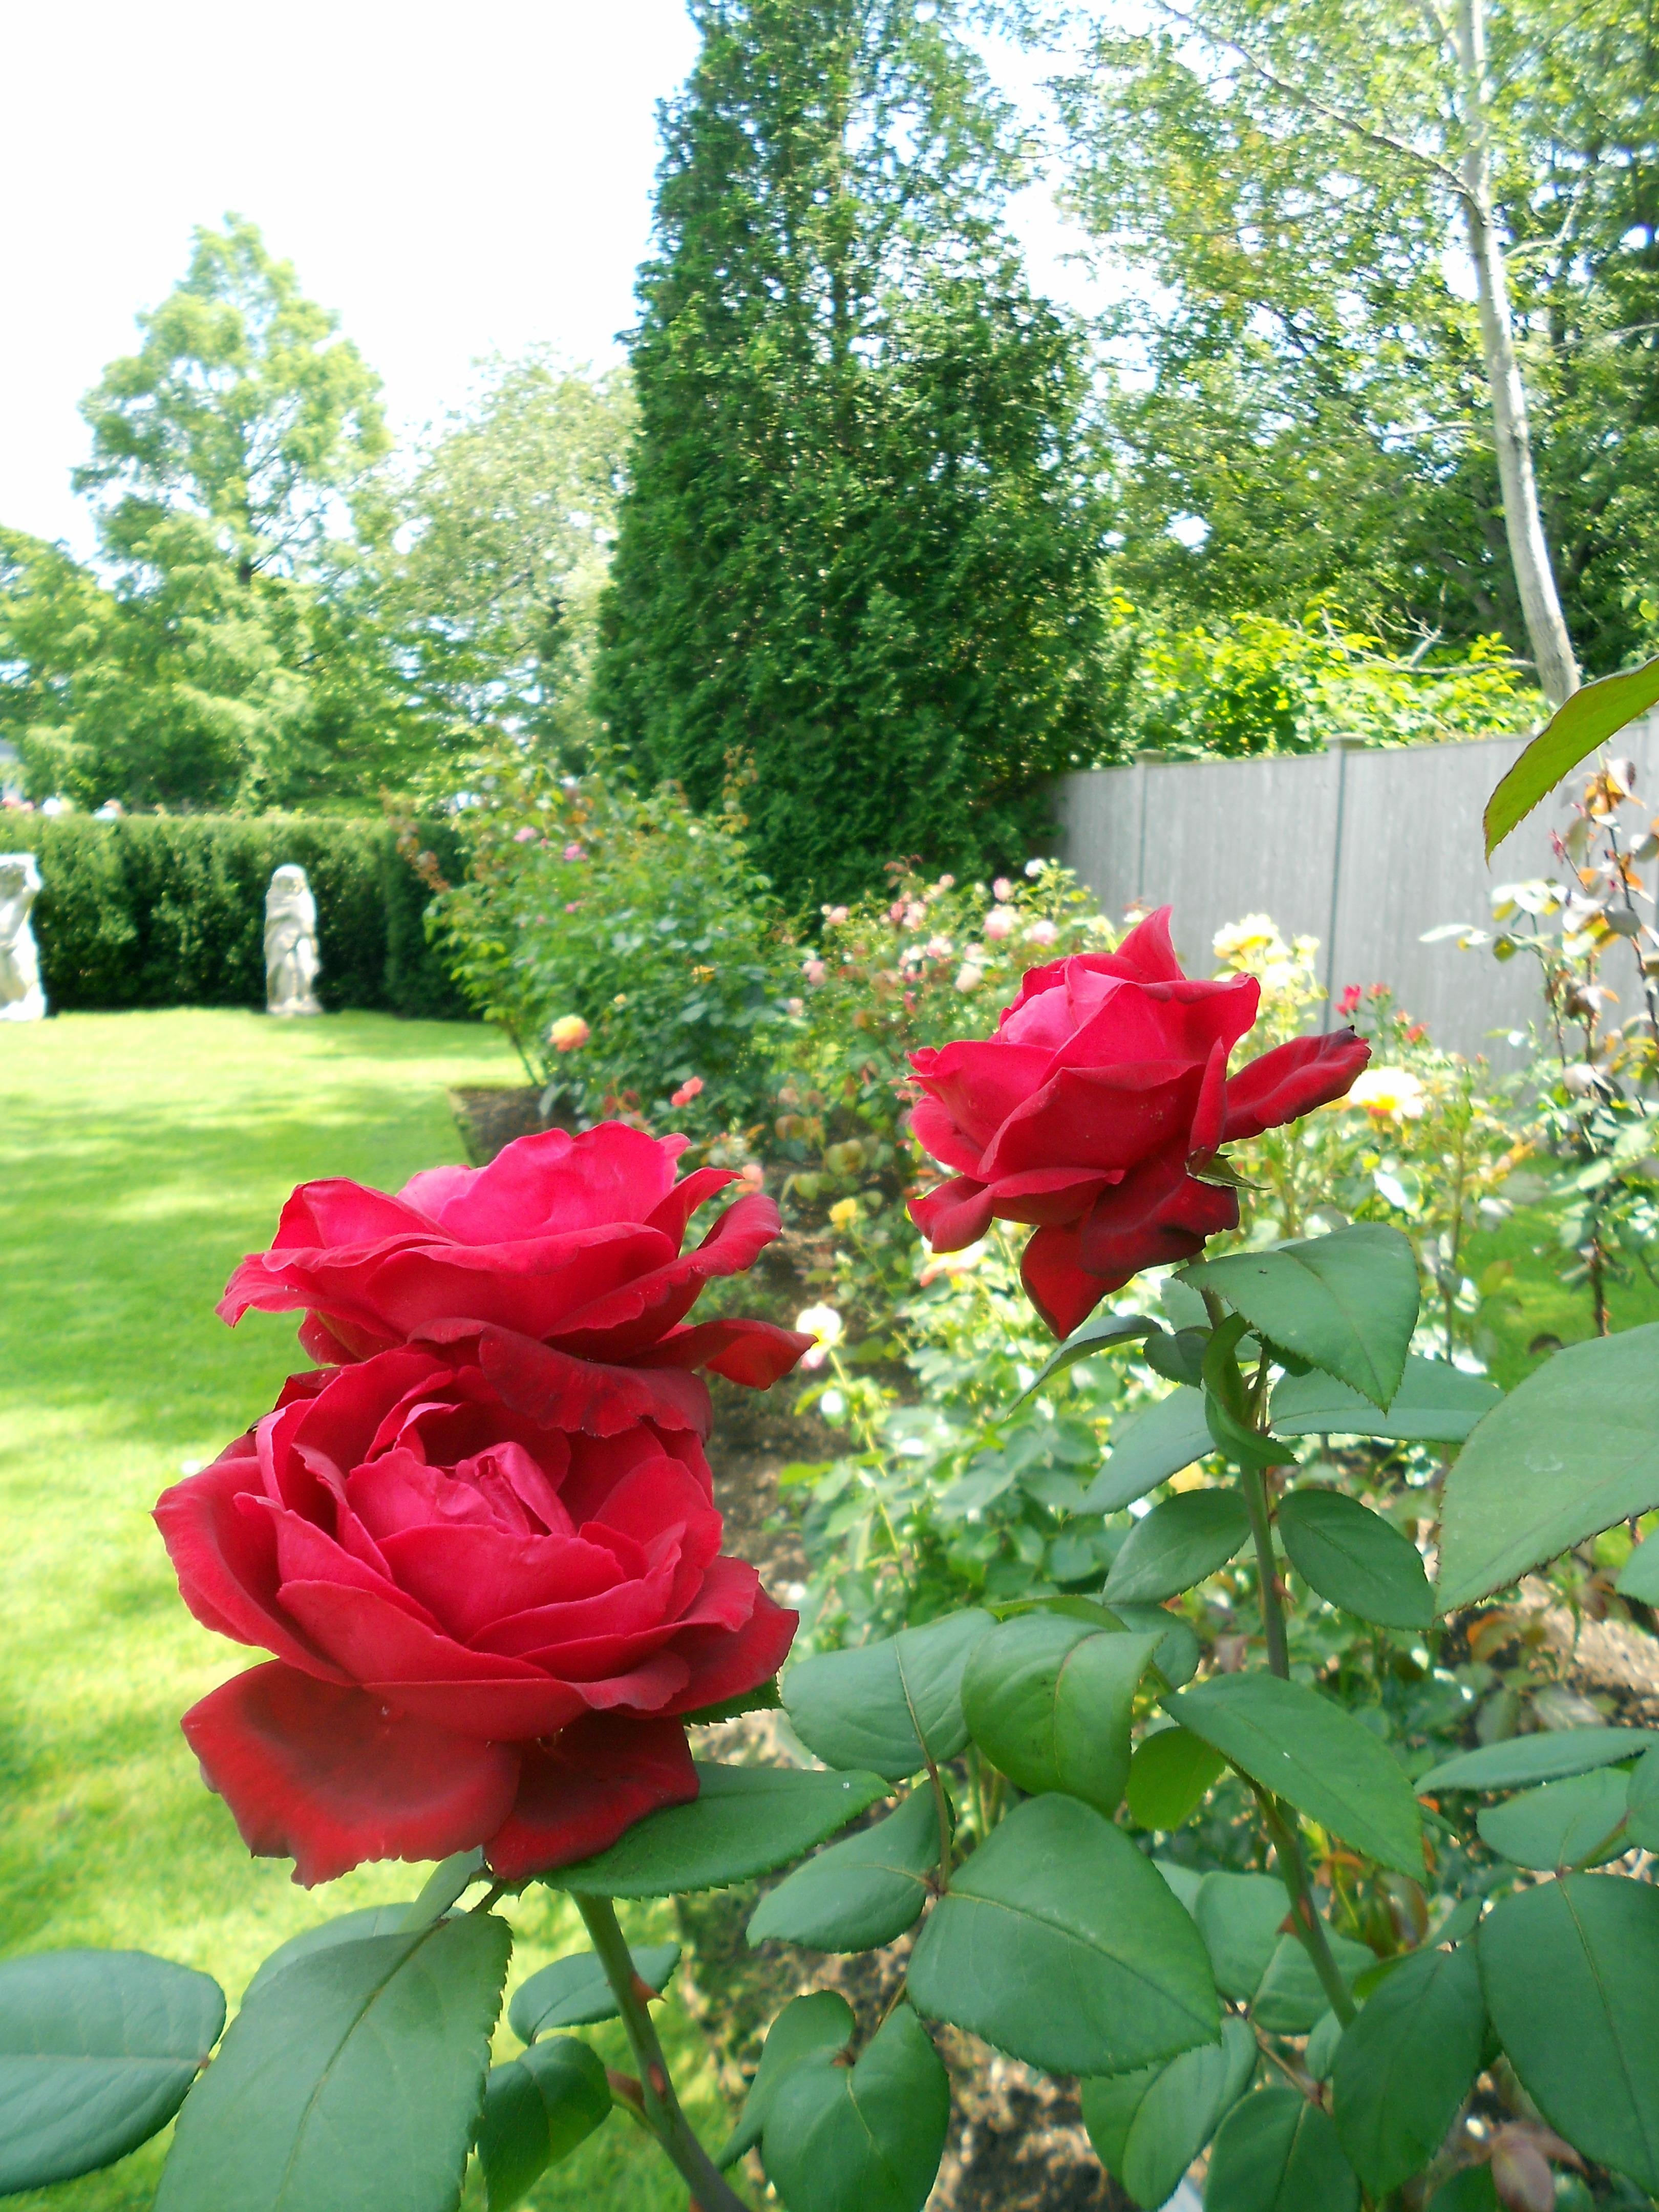 Summer Garden Toys: High Summer Gardens